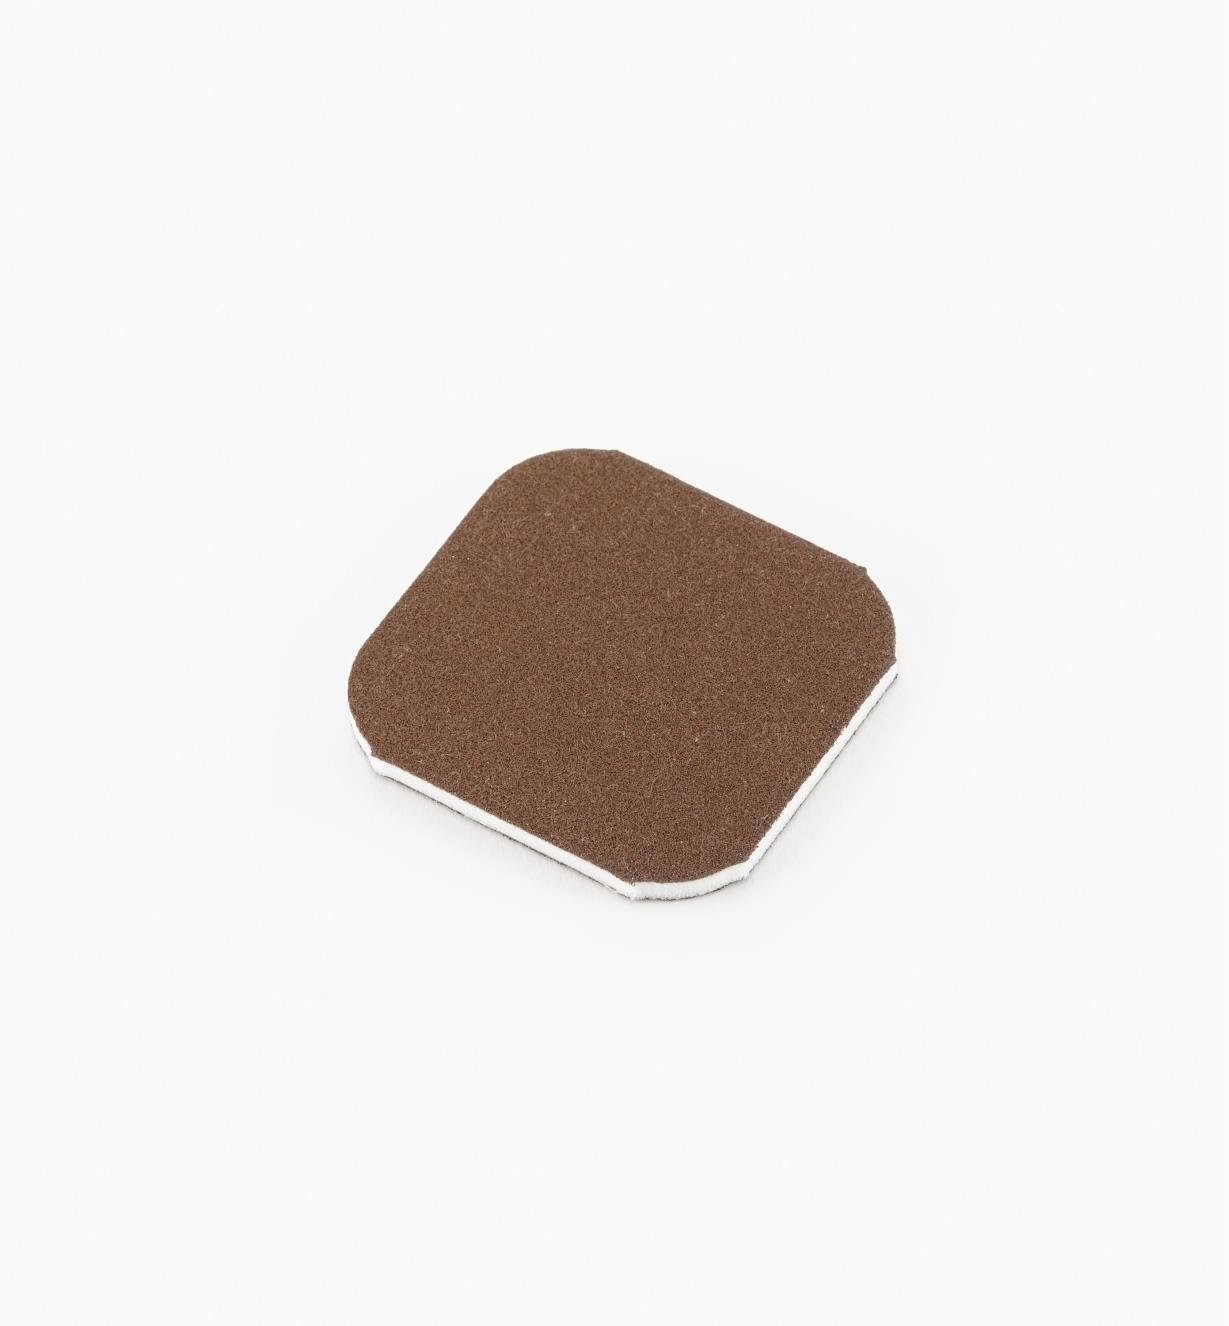 54K9010 - 1500x Micro-Mesh Pen-Sanding Pad, each